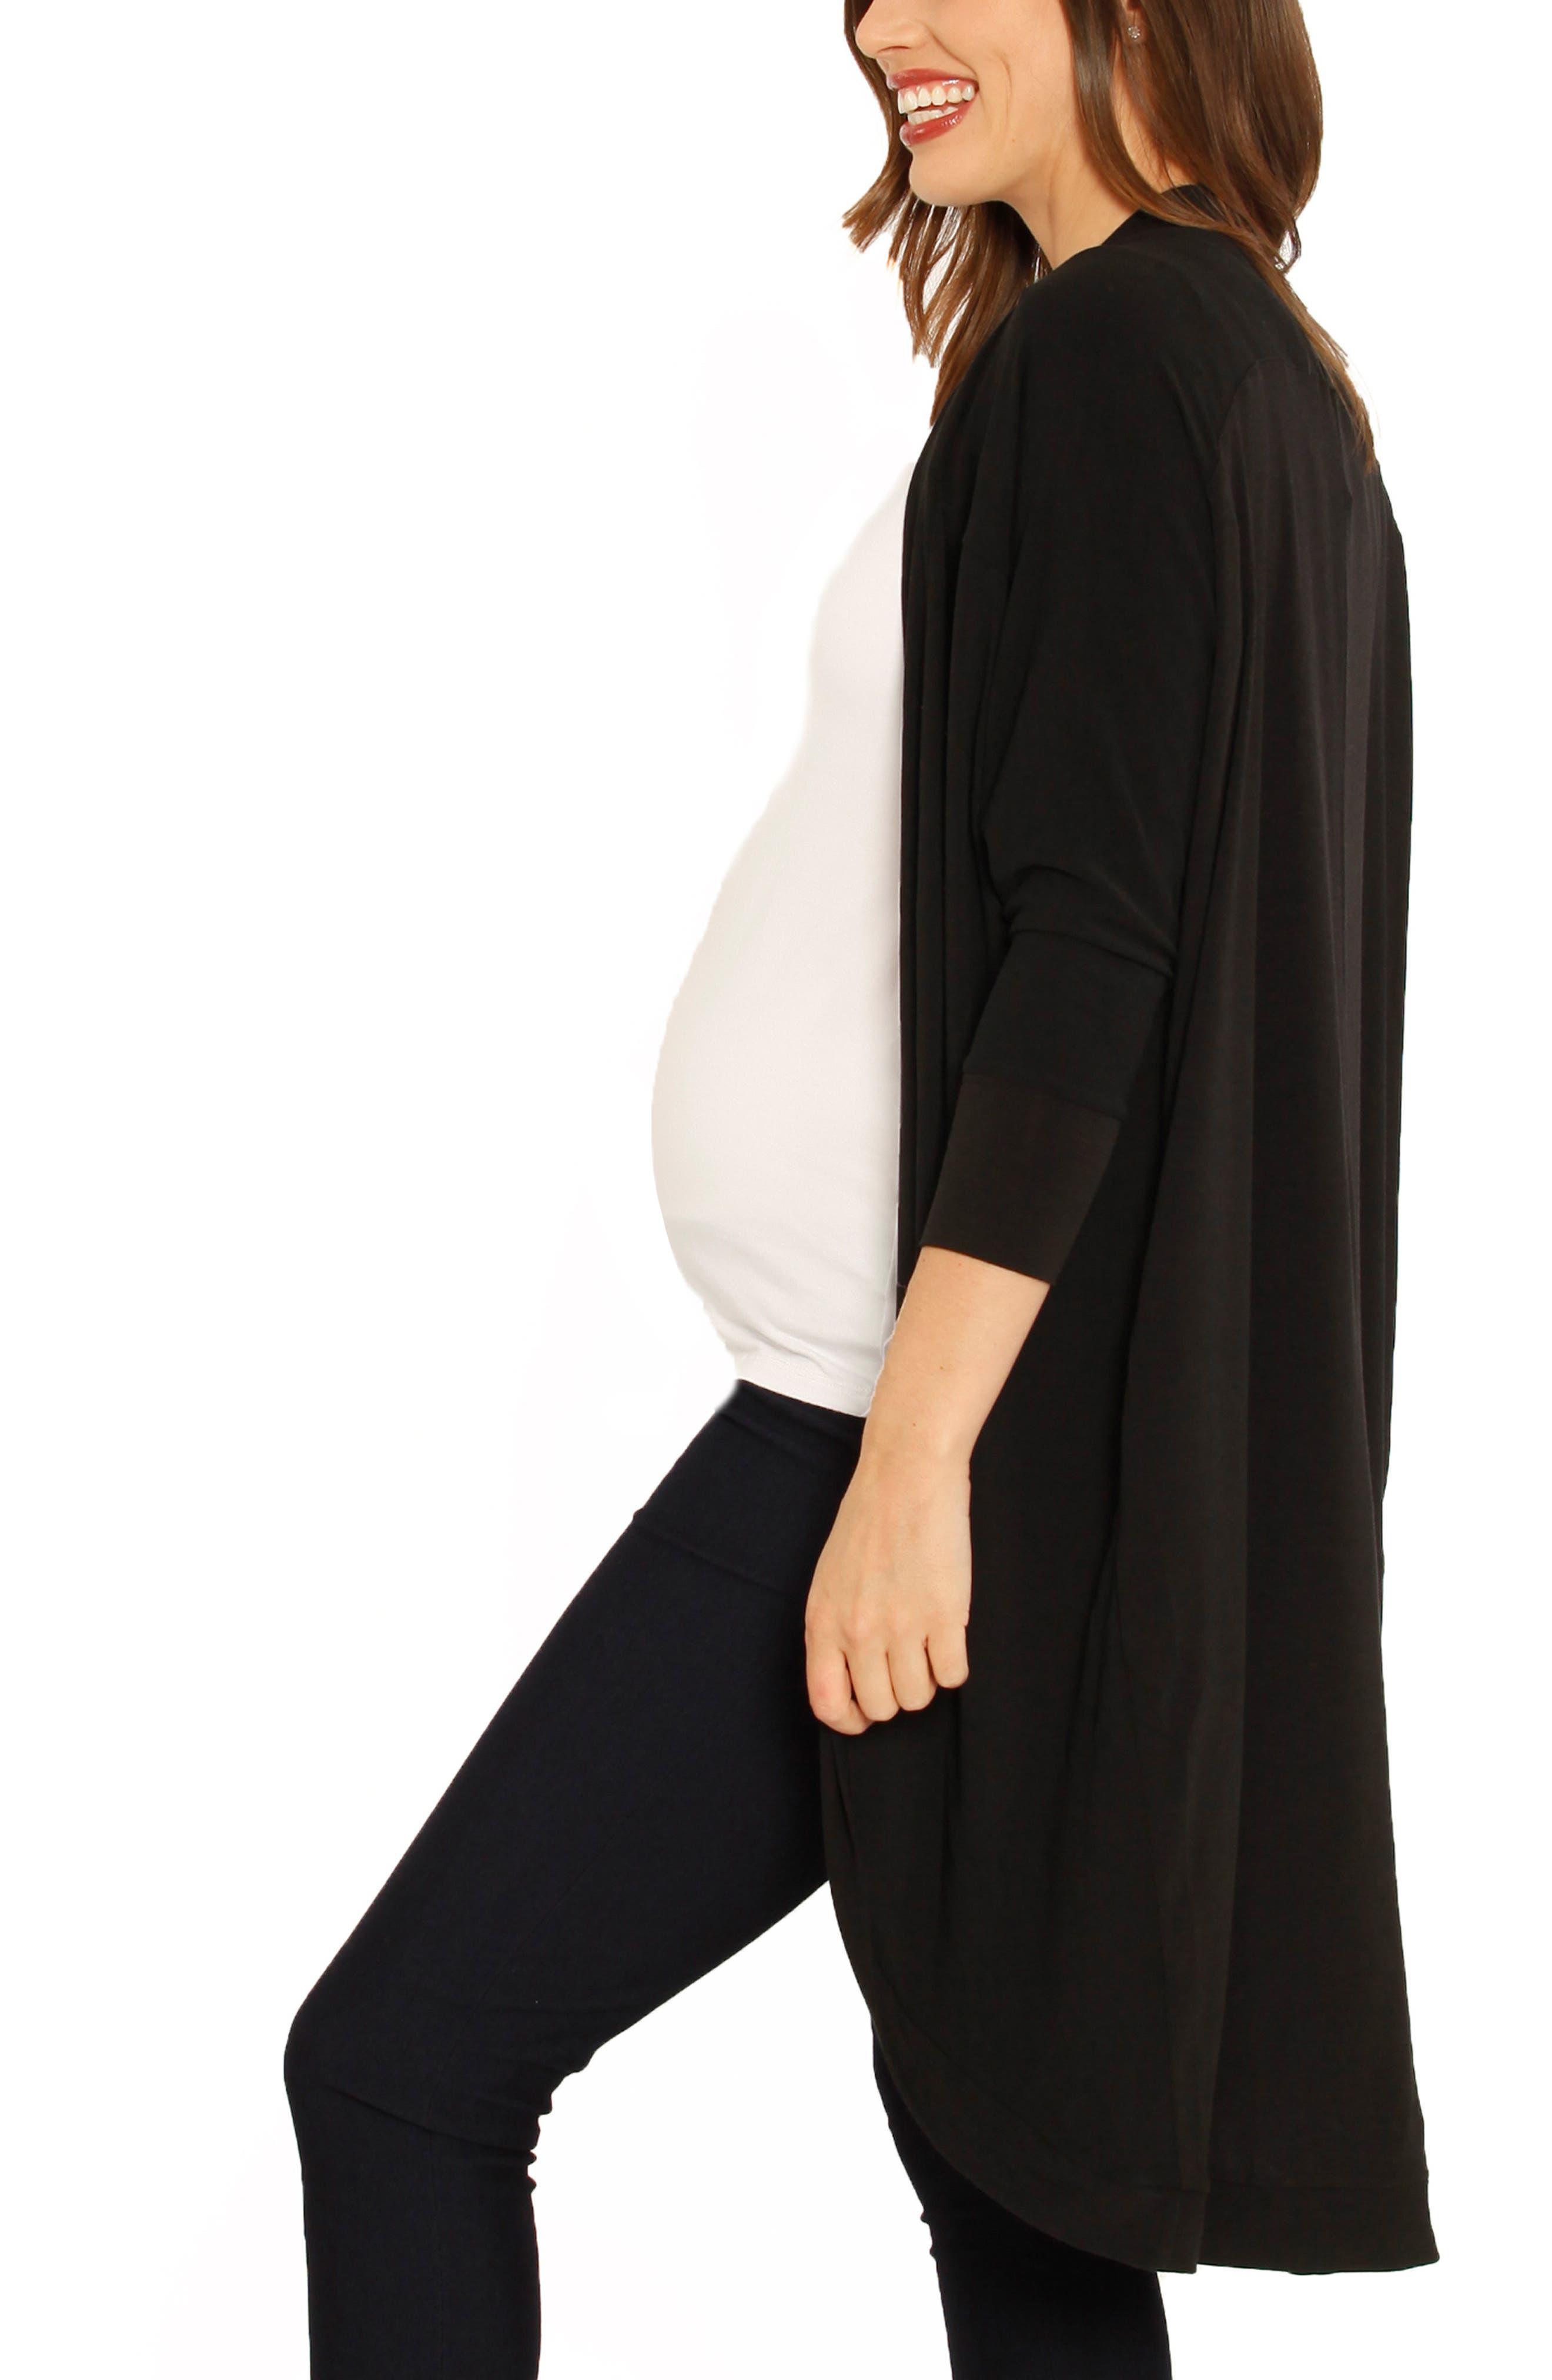 ANGEL MATERNITY,                             Scooped Maternity Cardigan,                             Alternate thumbnail 3, color,                             BLACK